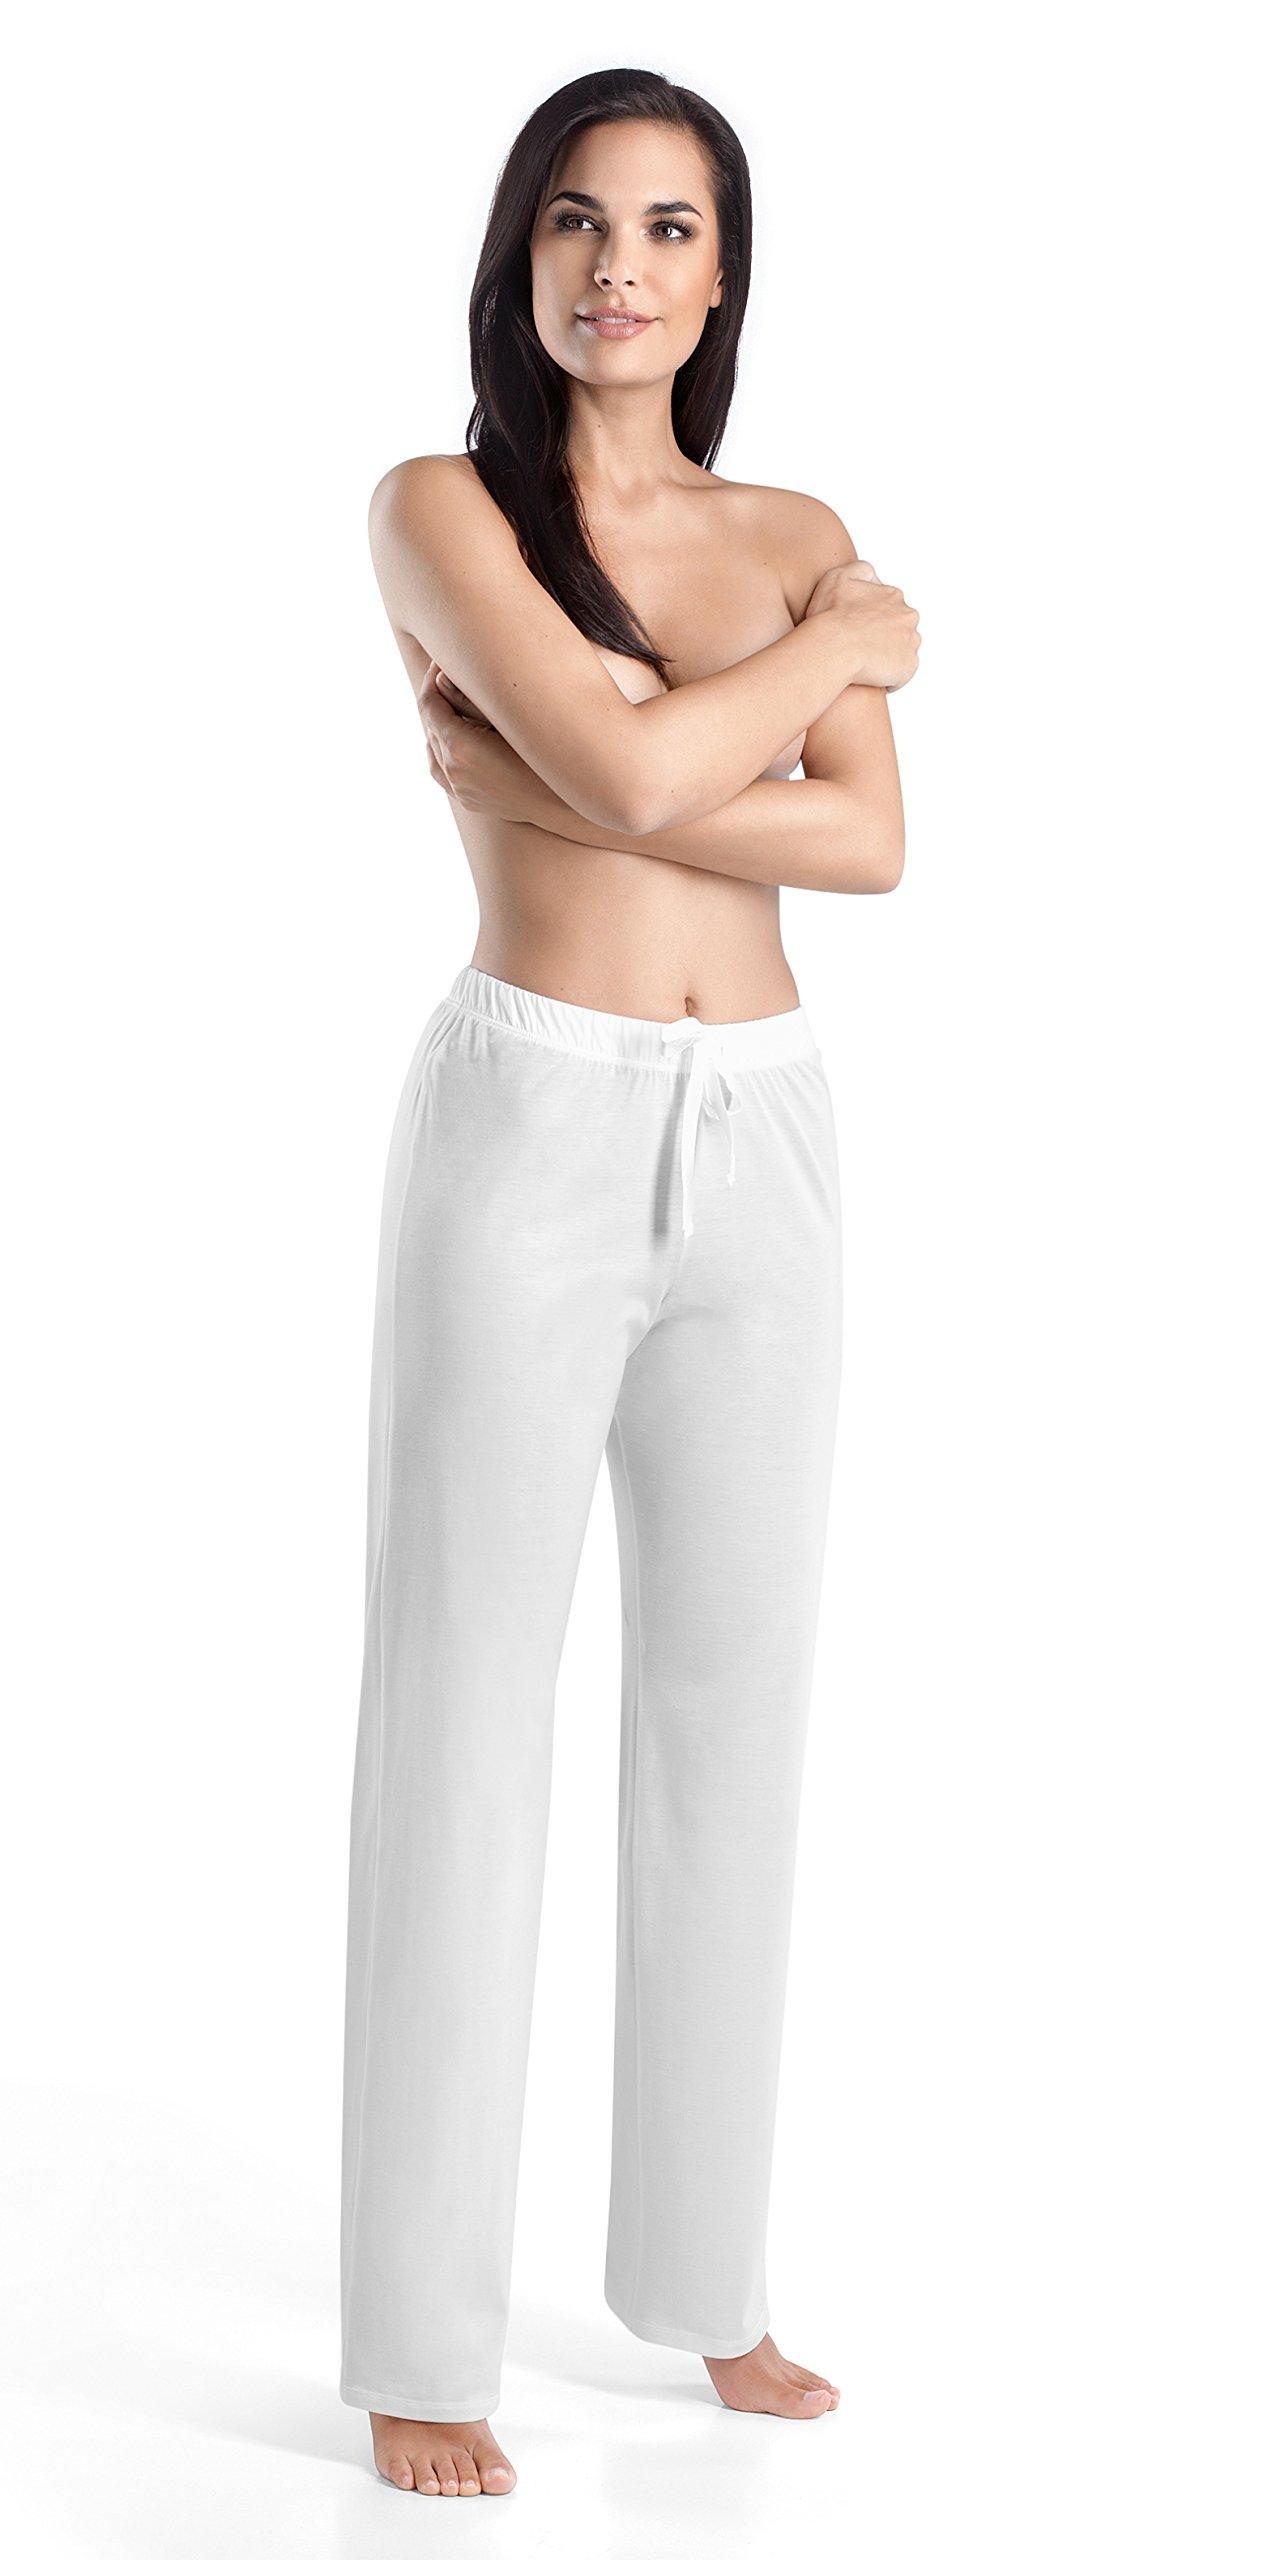 Hanro Women's Cotton Deluxe Drawstring Pajama Pant, White, X-Small